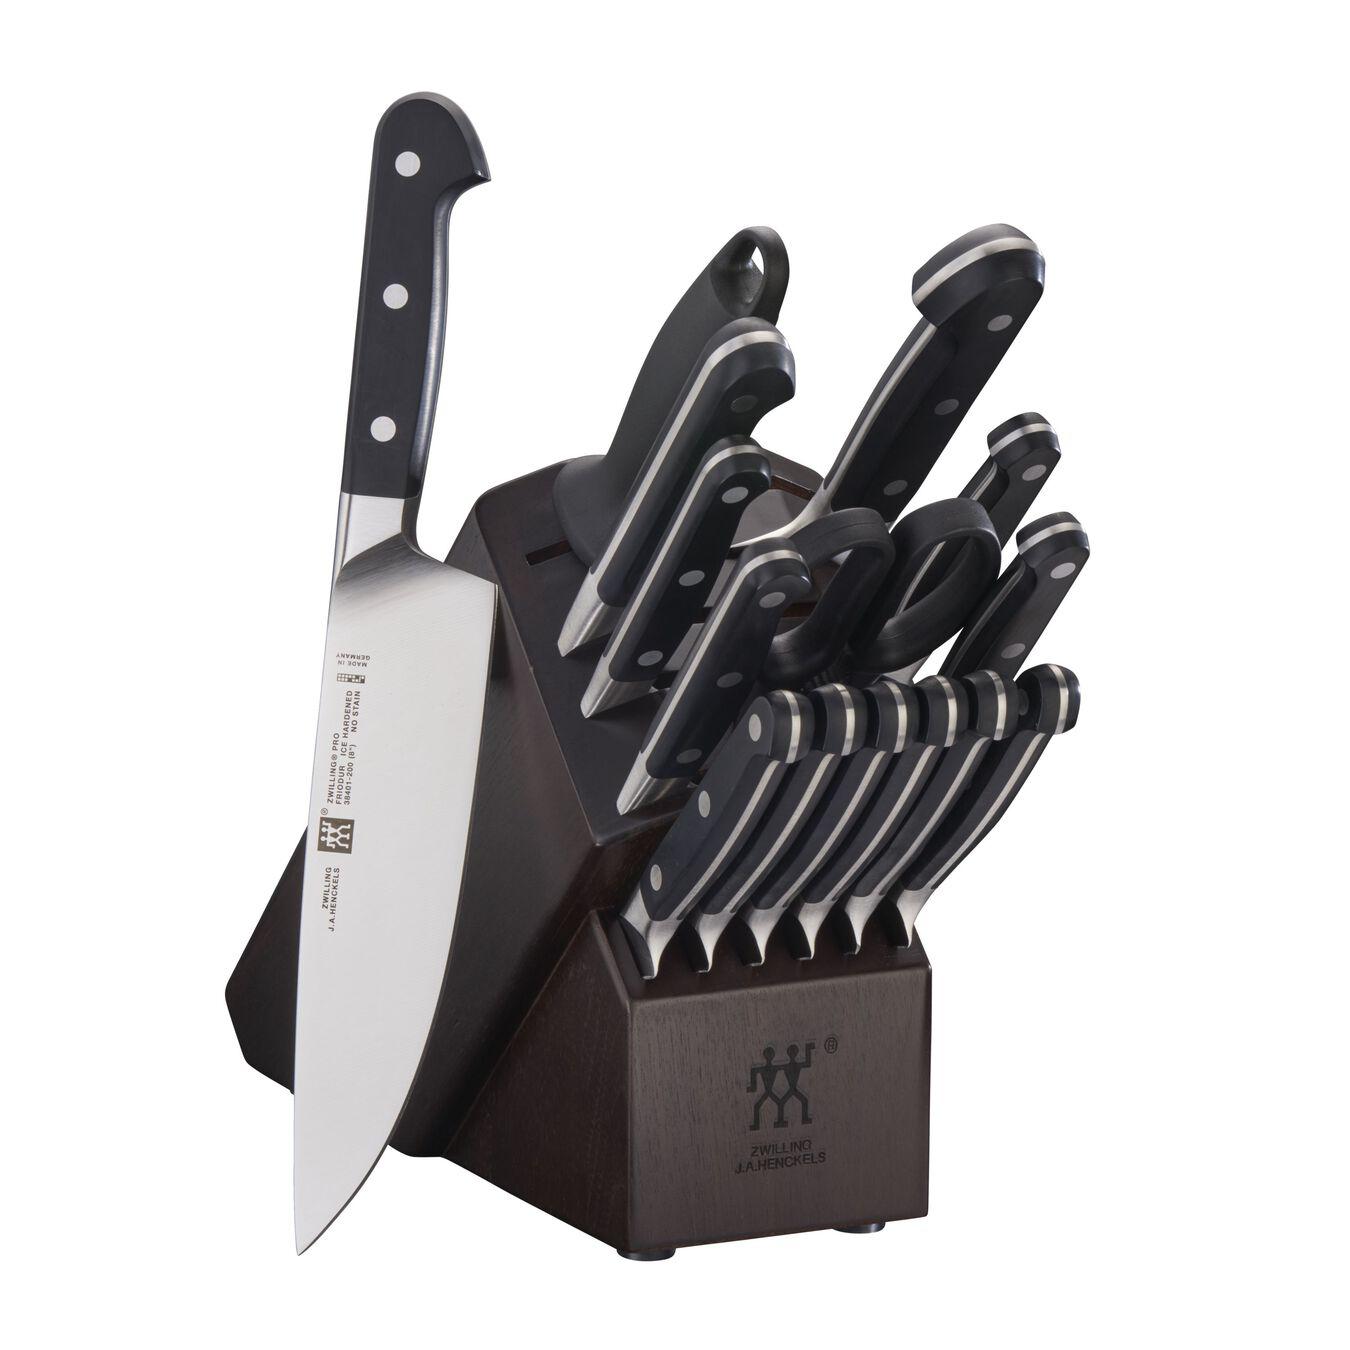 16-pc Knife Block Set - Walnut,,large 1